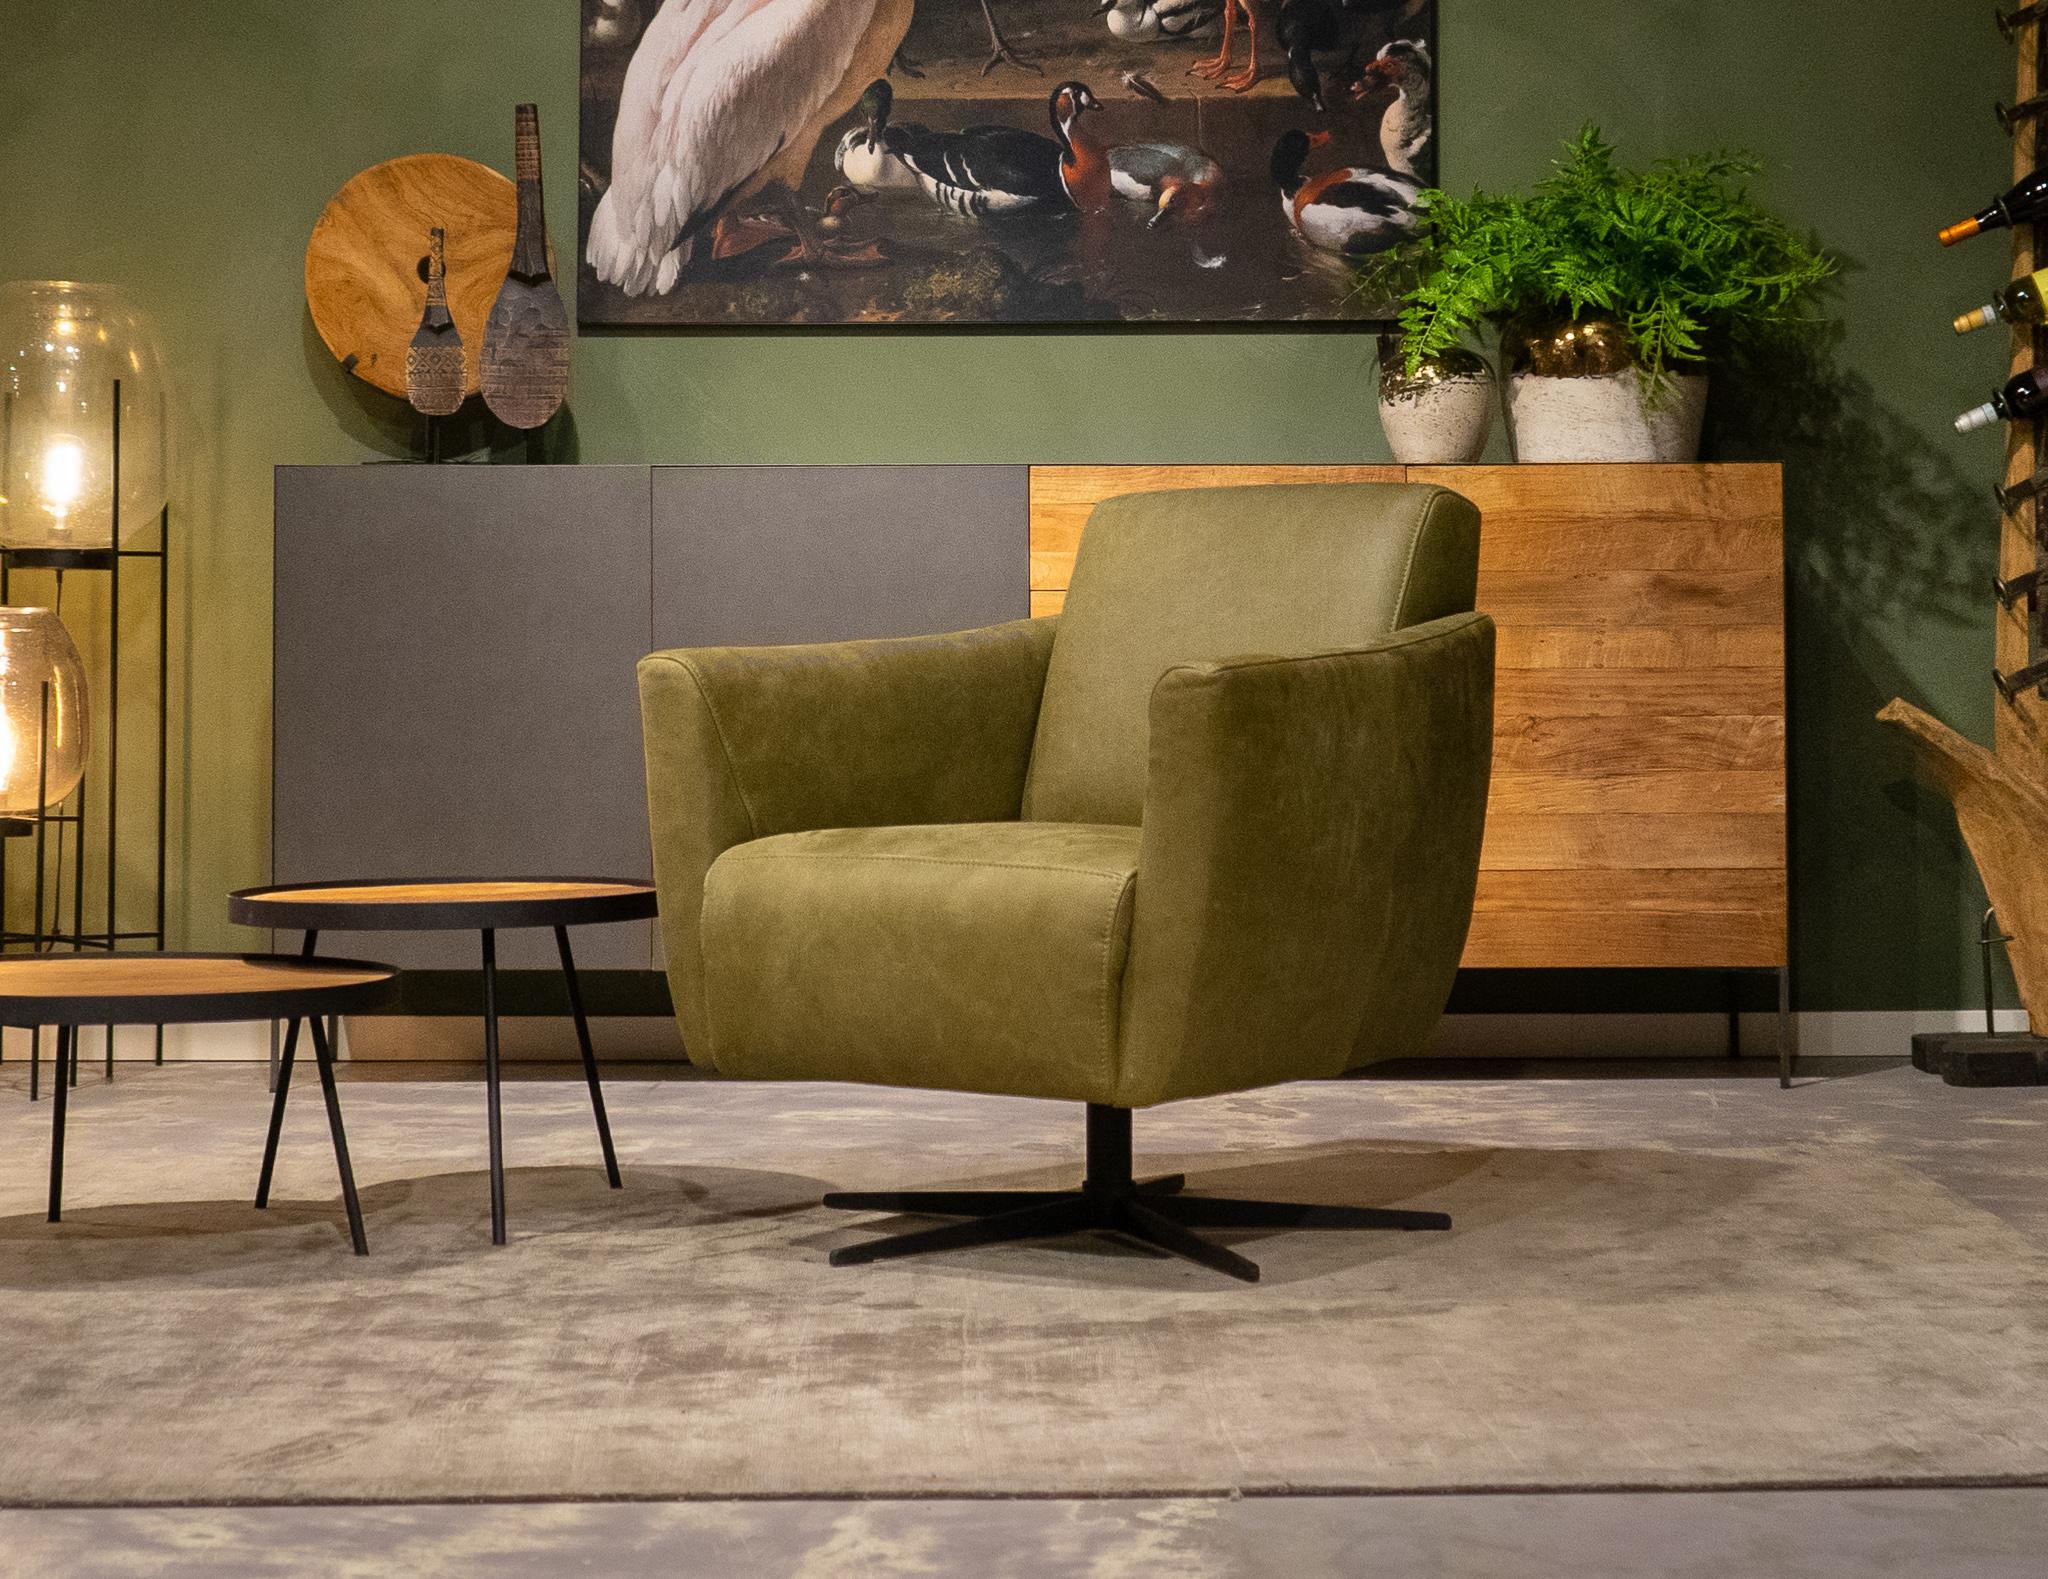 robuuste leren stoel